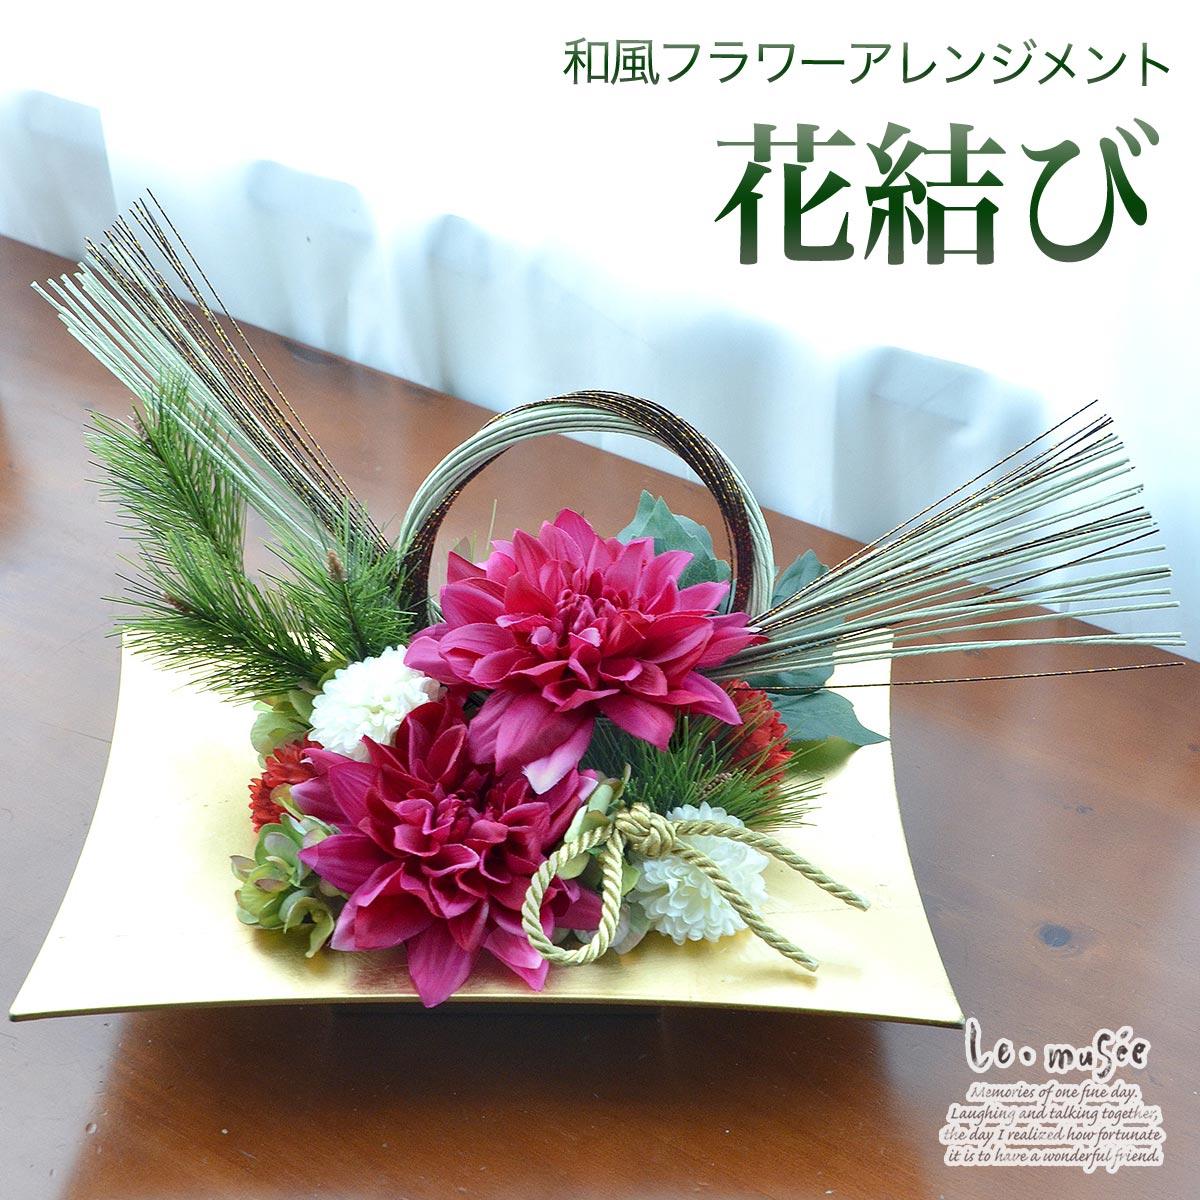 lemusee: Japanese-style flower arrangement Japanese style ...